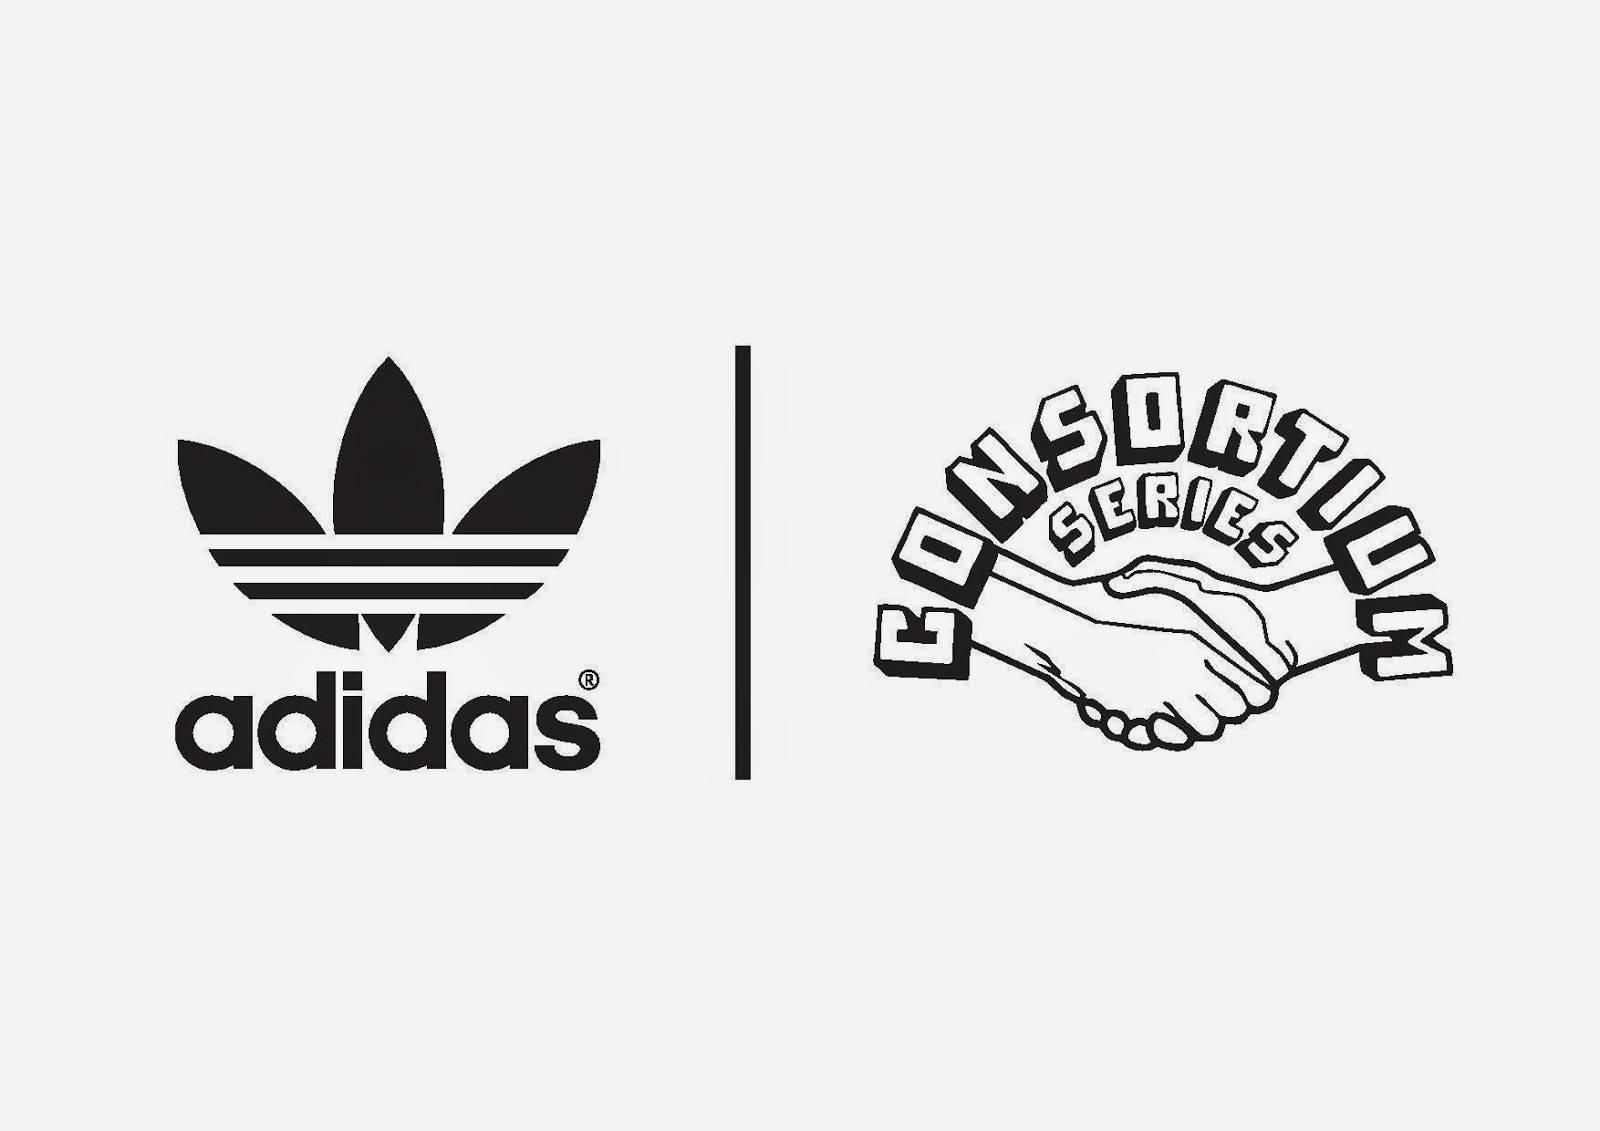 Логотип adidas Consortium - Stone Forest